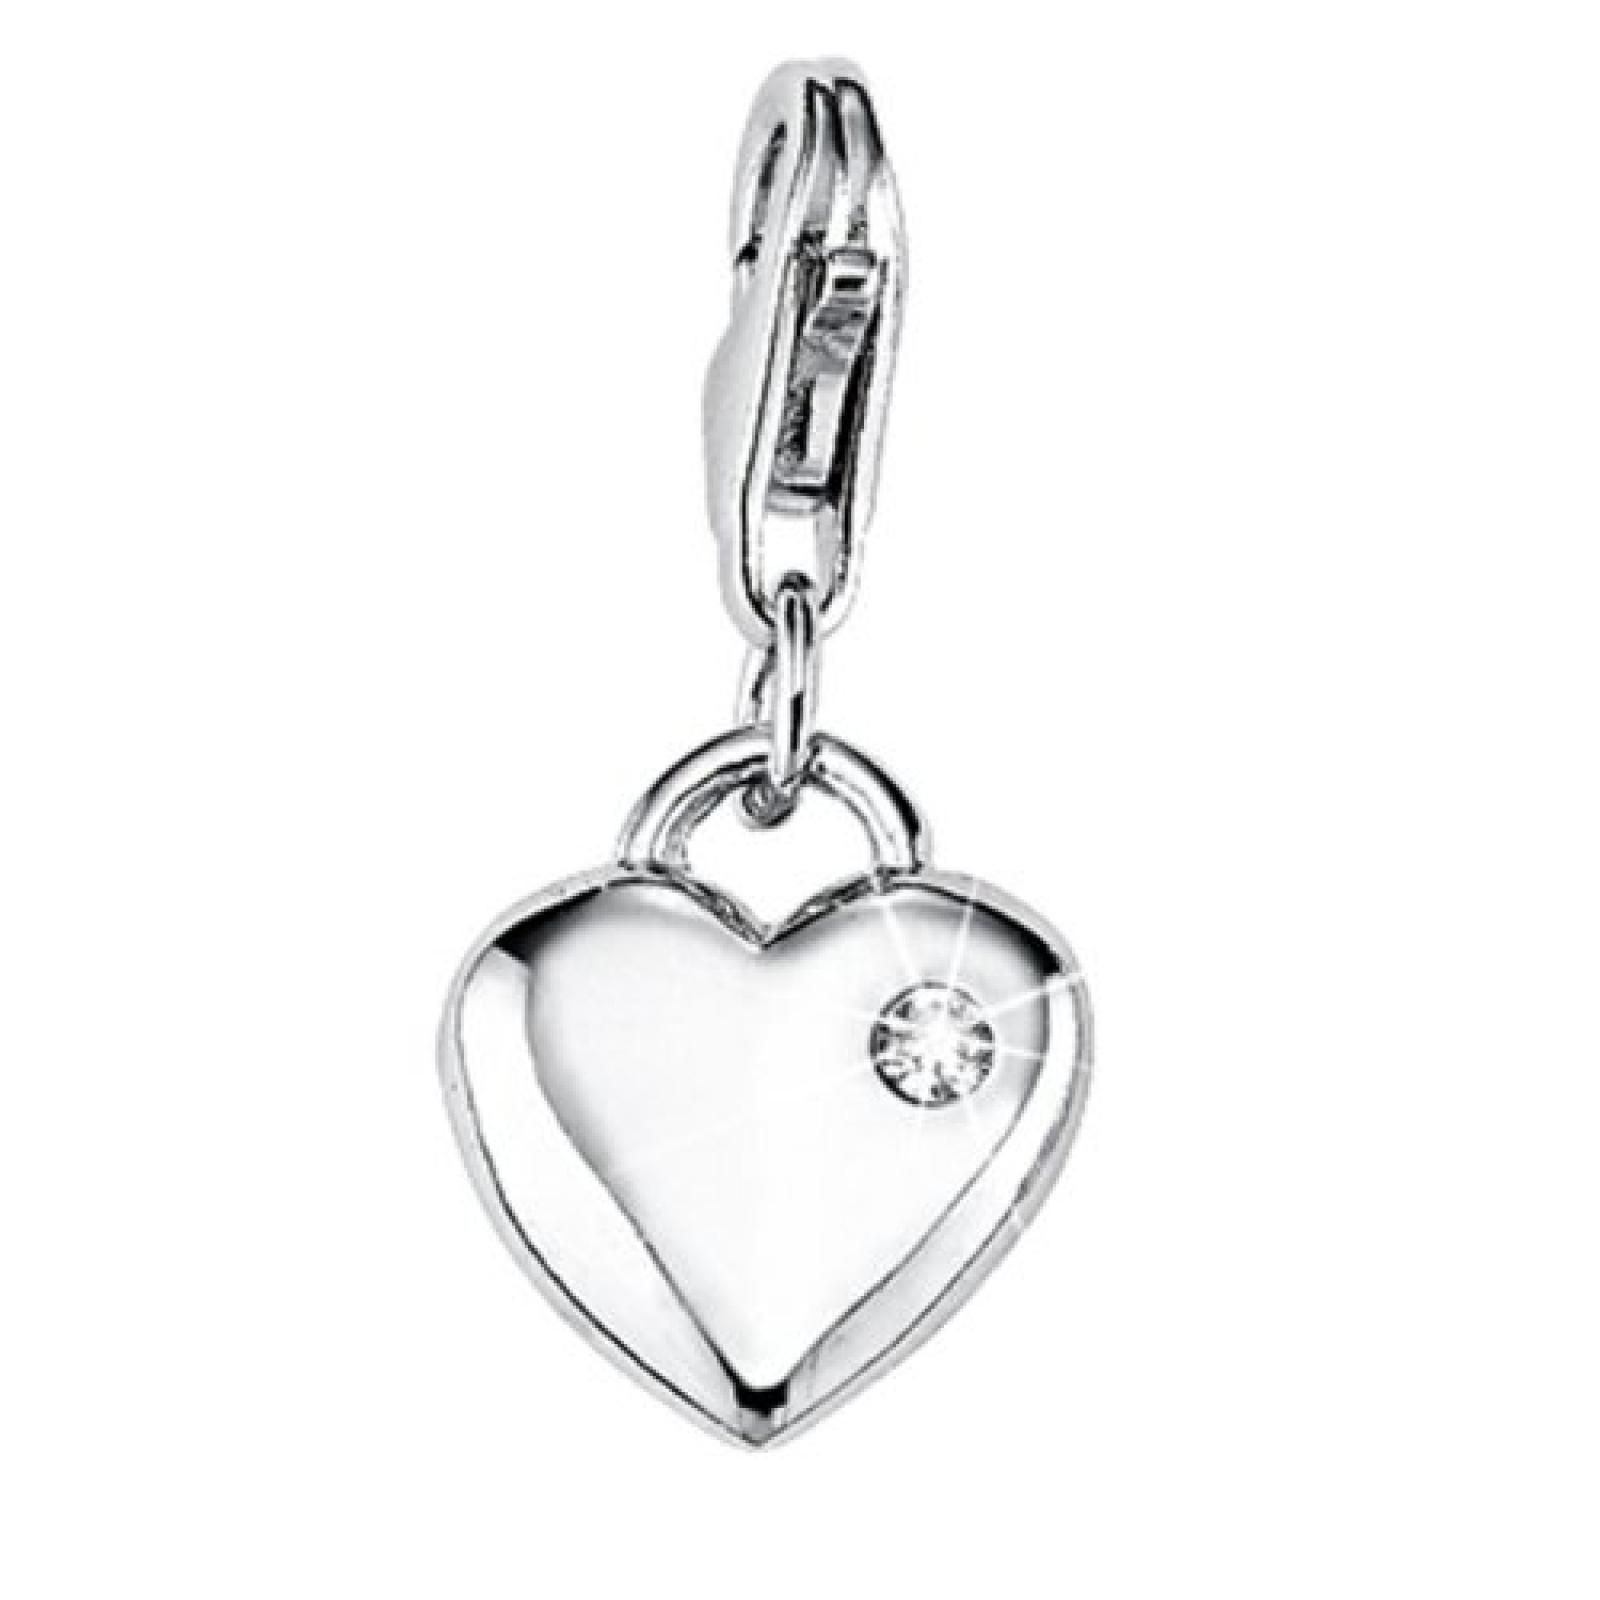 s.Oliver Damen-Charm 925 Sterling Silber Herz Zirkonia synth. Länge ca. 12 mm 385725